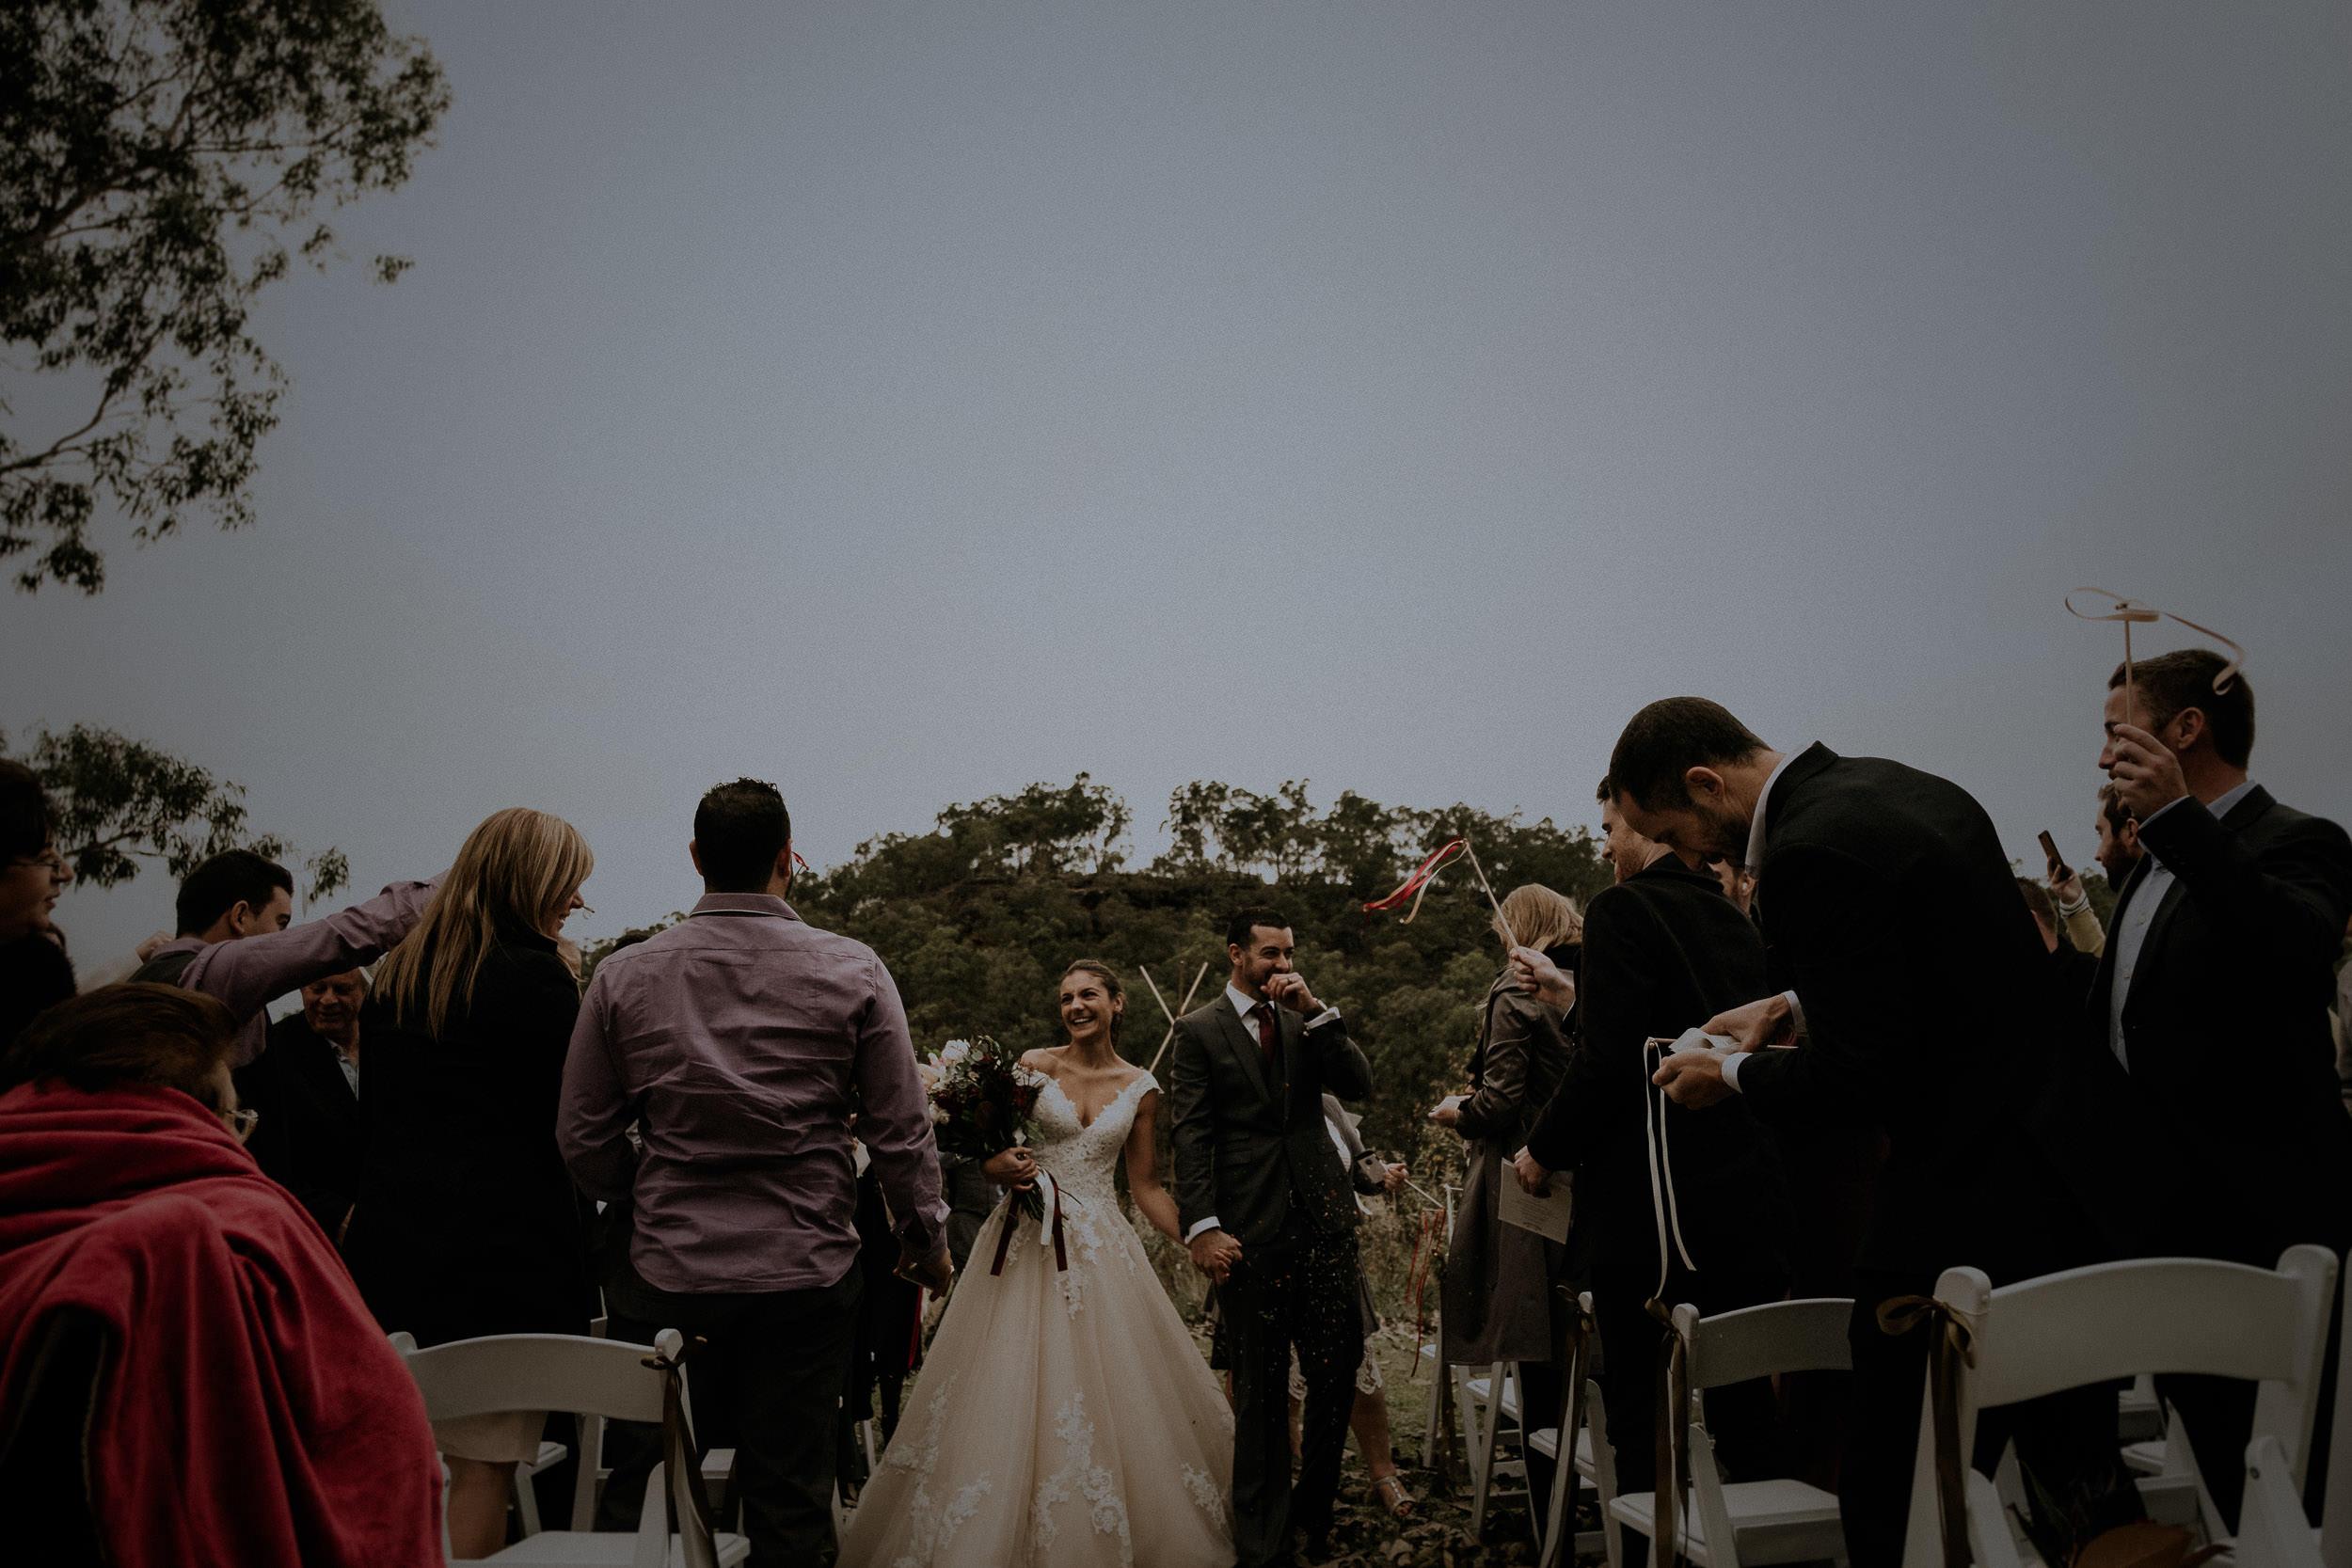 g_c wedding - kings _ thieves elopement wedding photography - blog 54.jpg